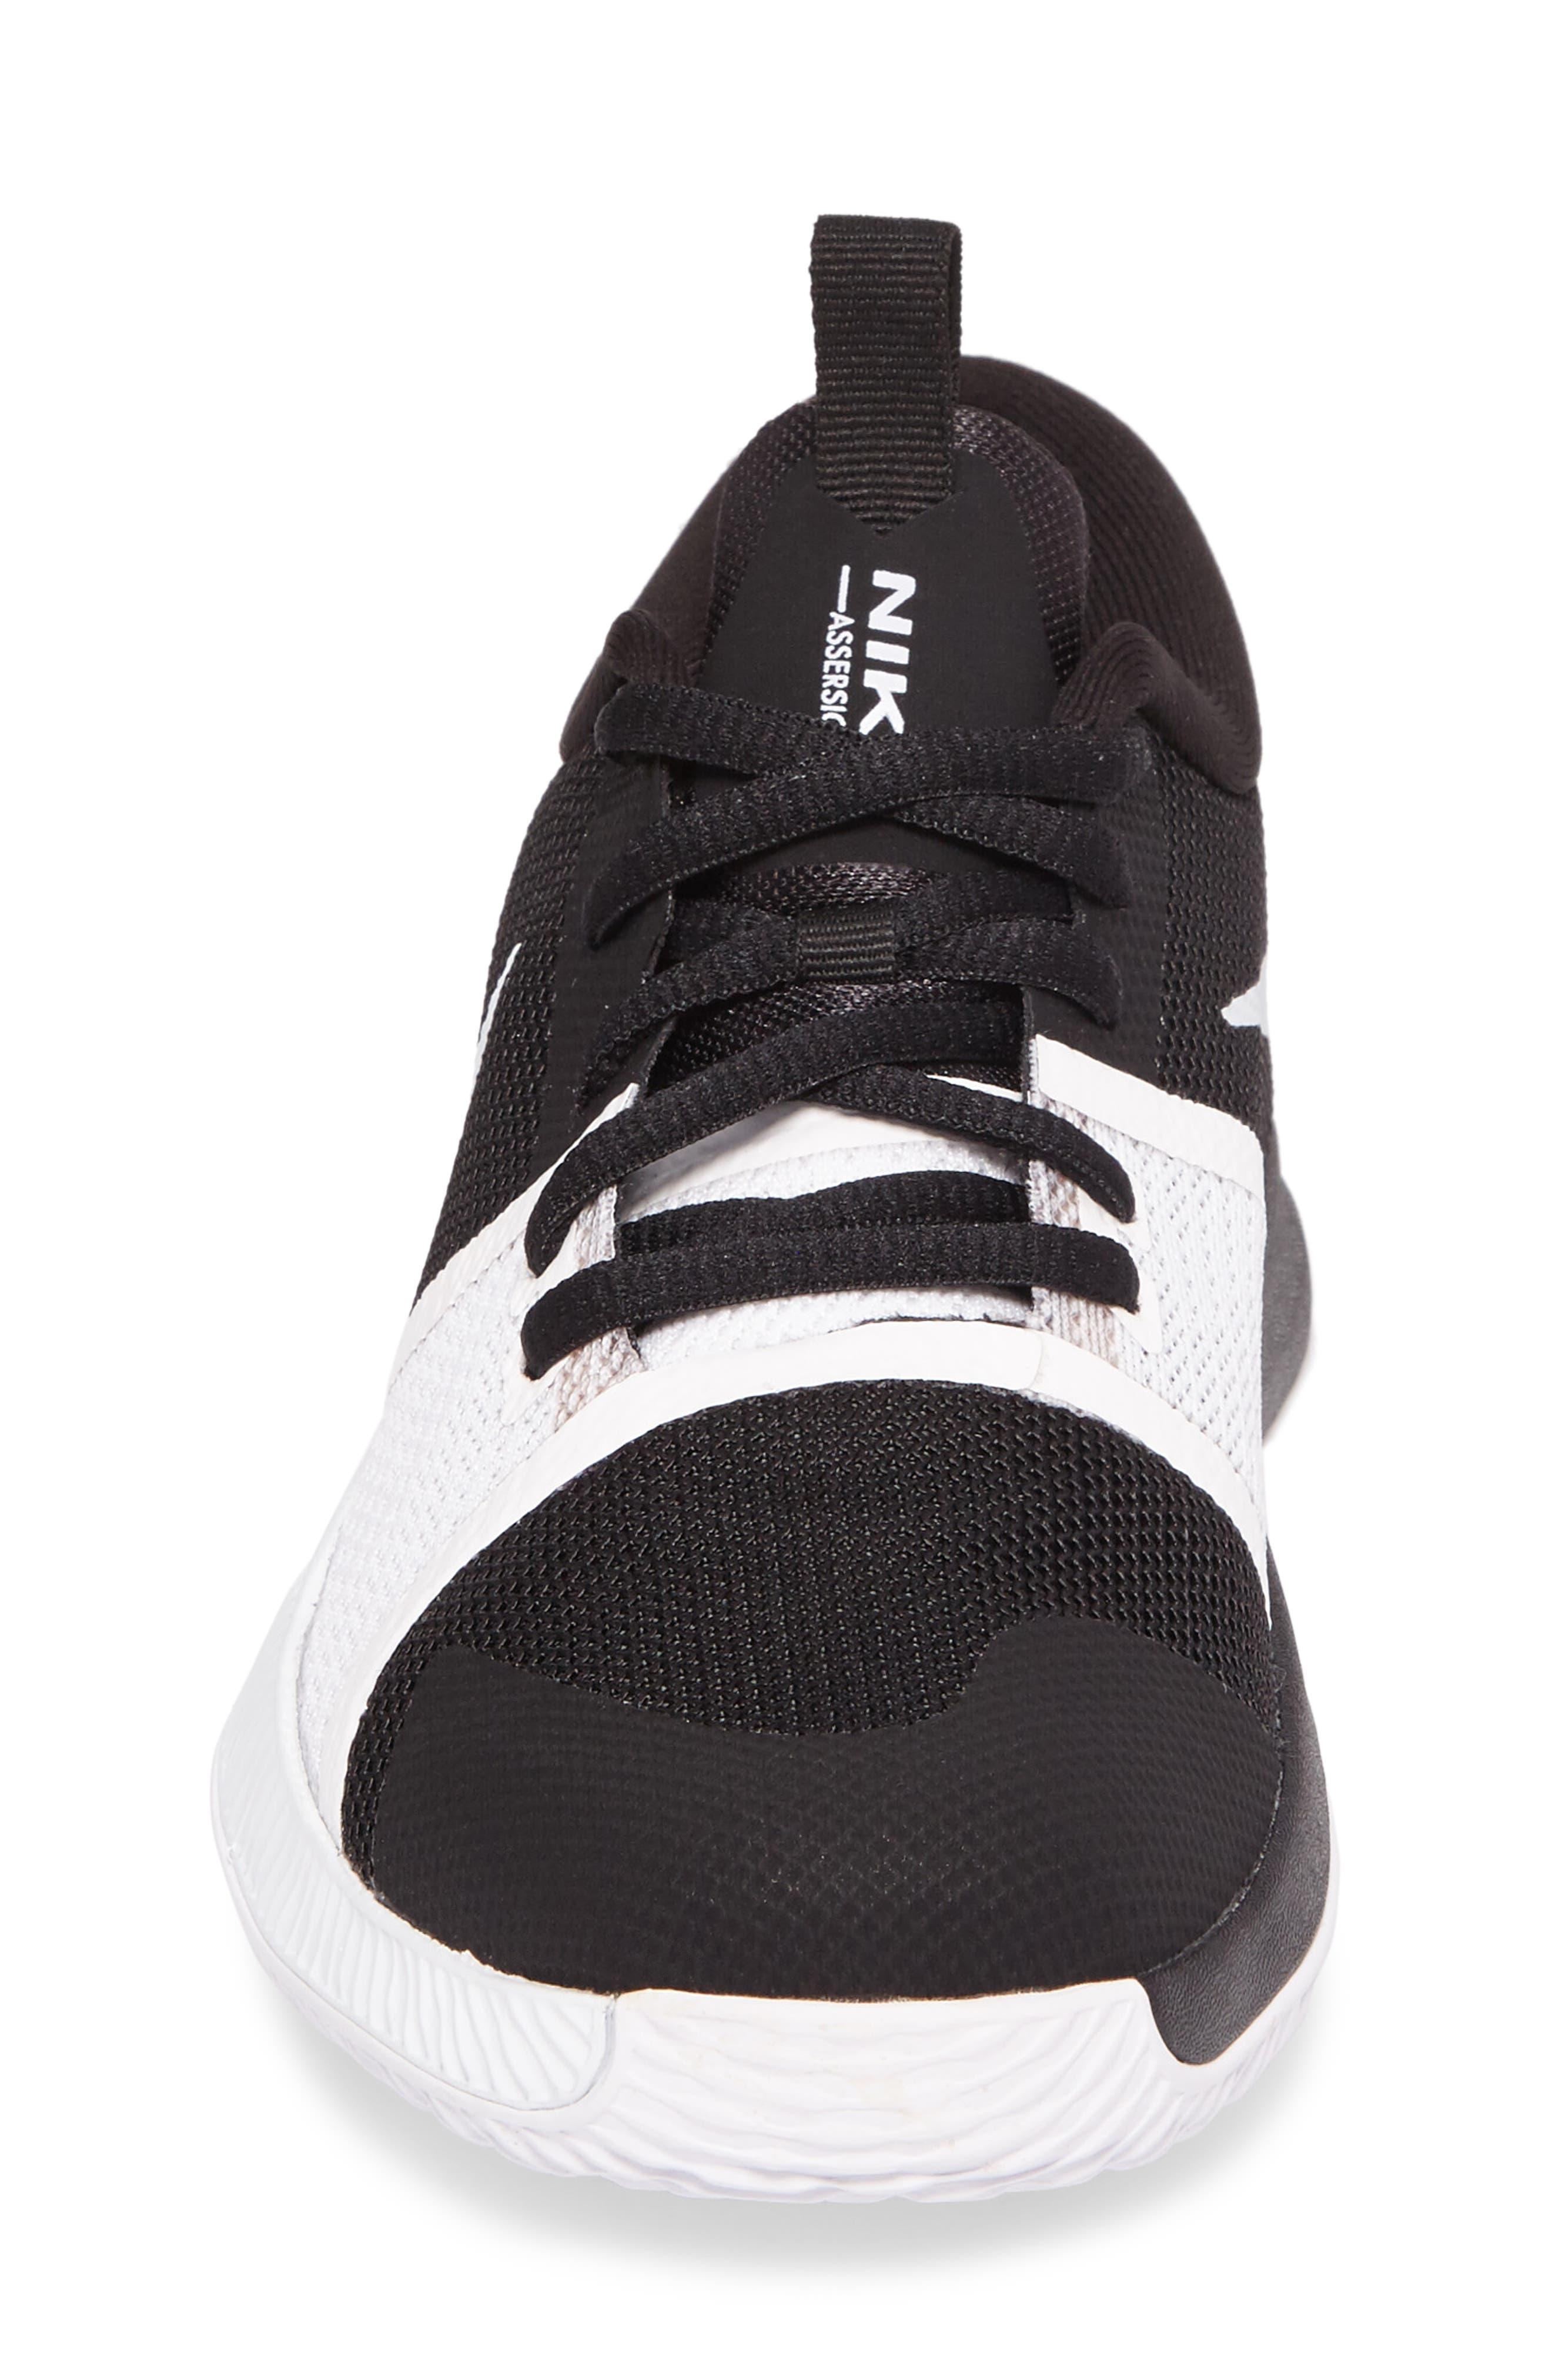 Assersion Sneaker,                             Alternate thumbnail 4, color,                             005